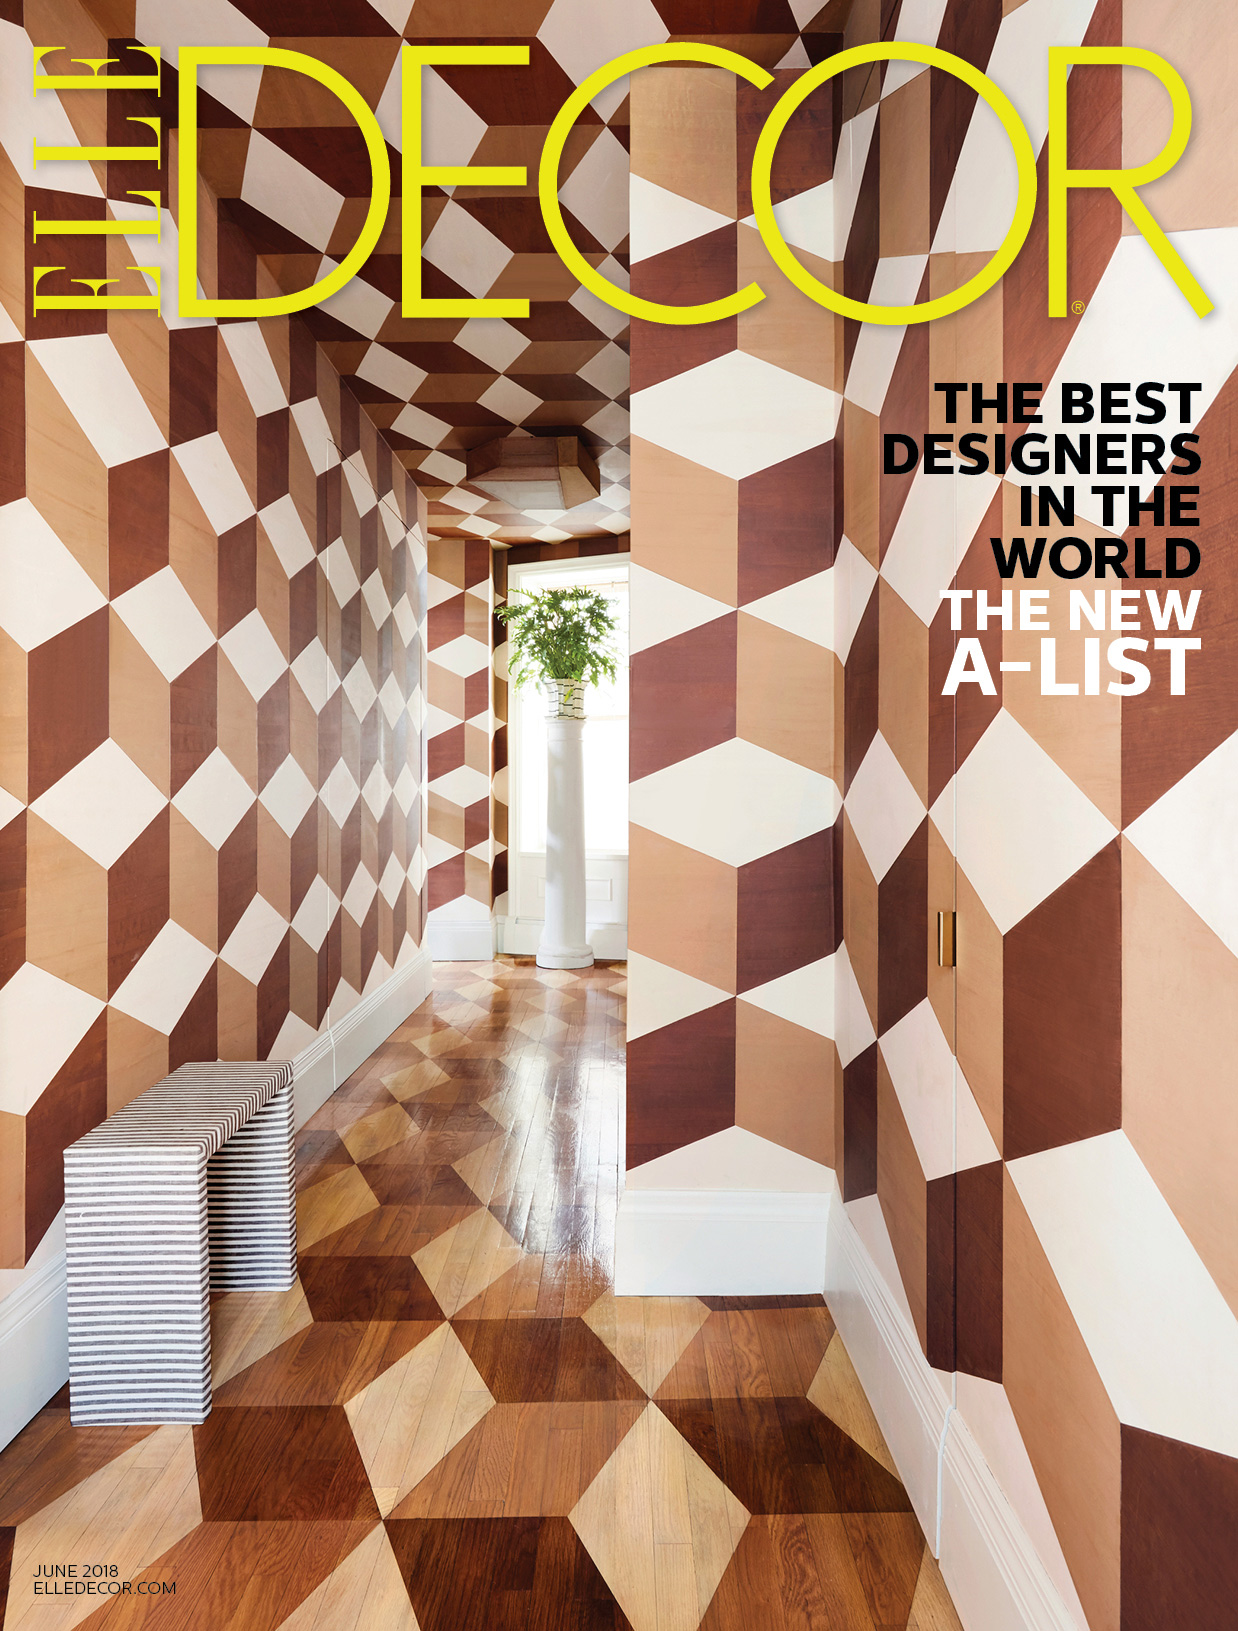 Elle Decor Interior Designers elle decor a-list — peter dunham design